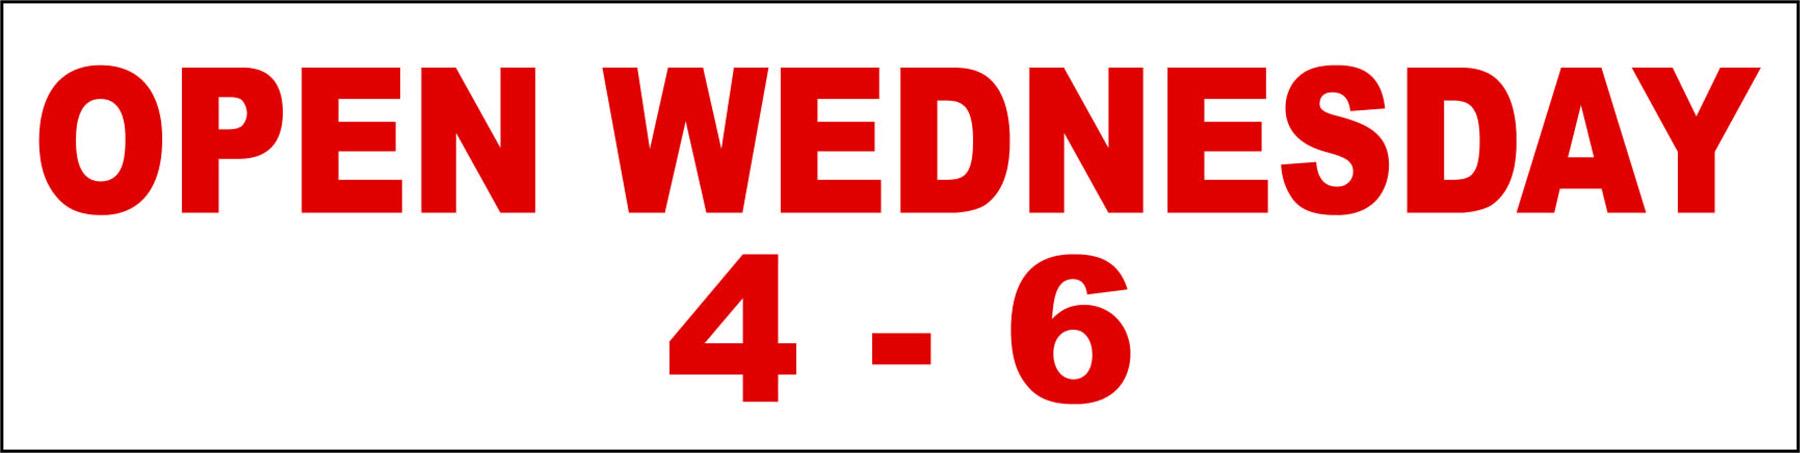 Open Wednesday 4-6